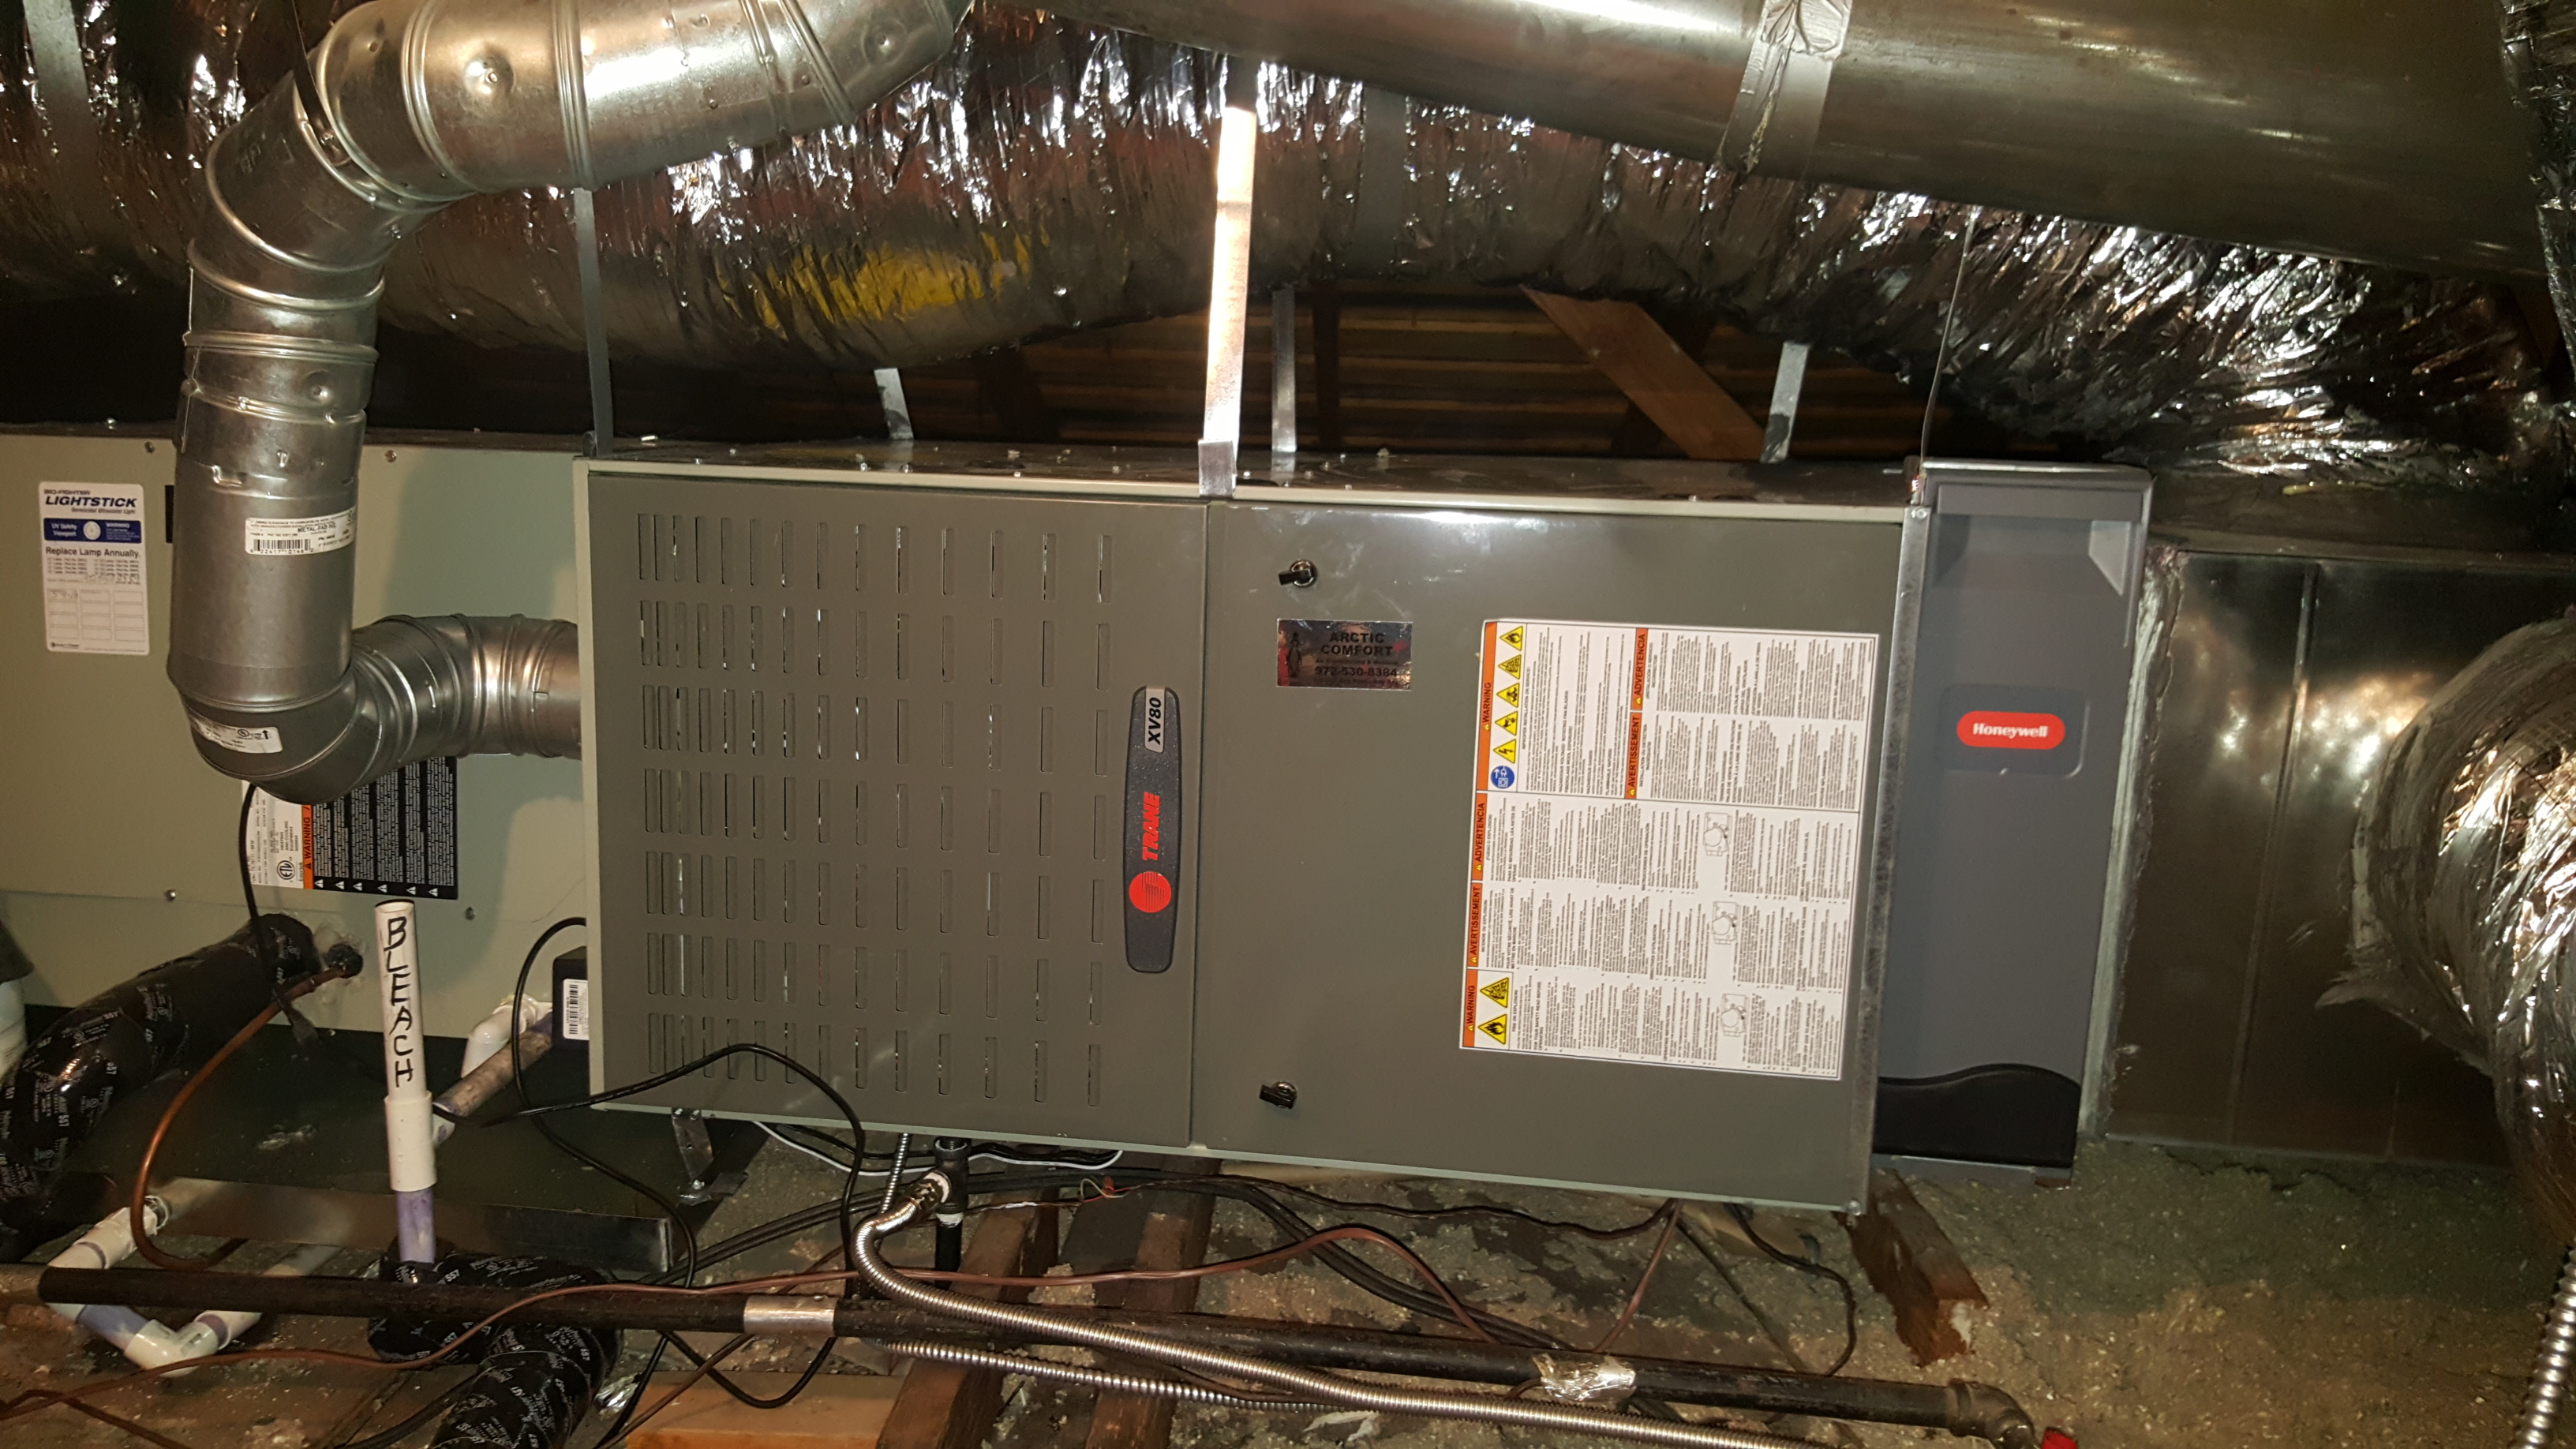 Trane Furnace and Honeywell Media Filter System